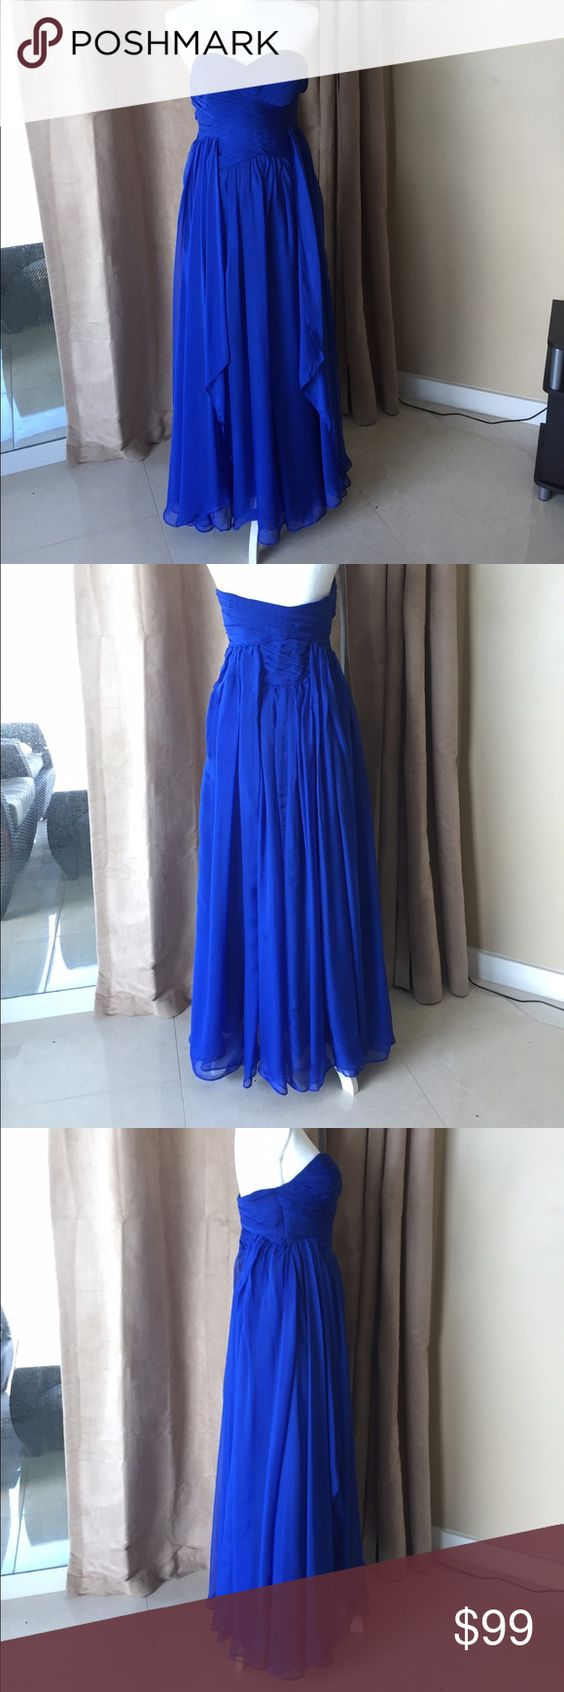 Royal blue prom dress size small